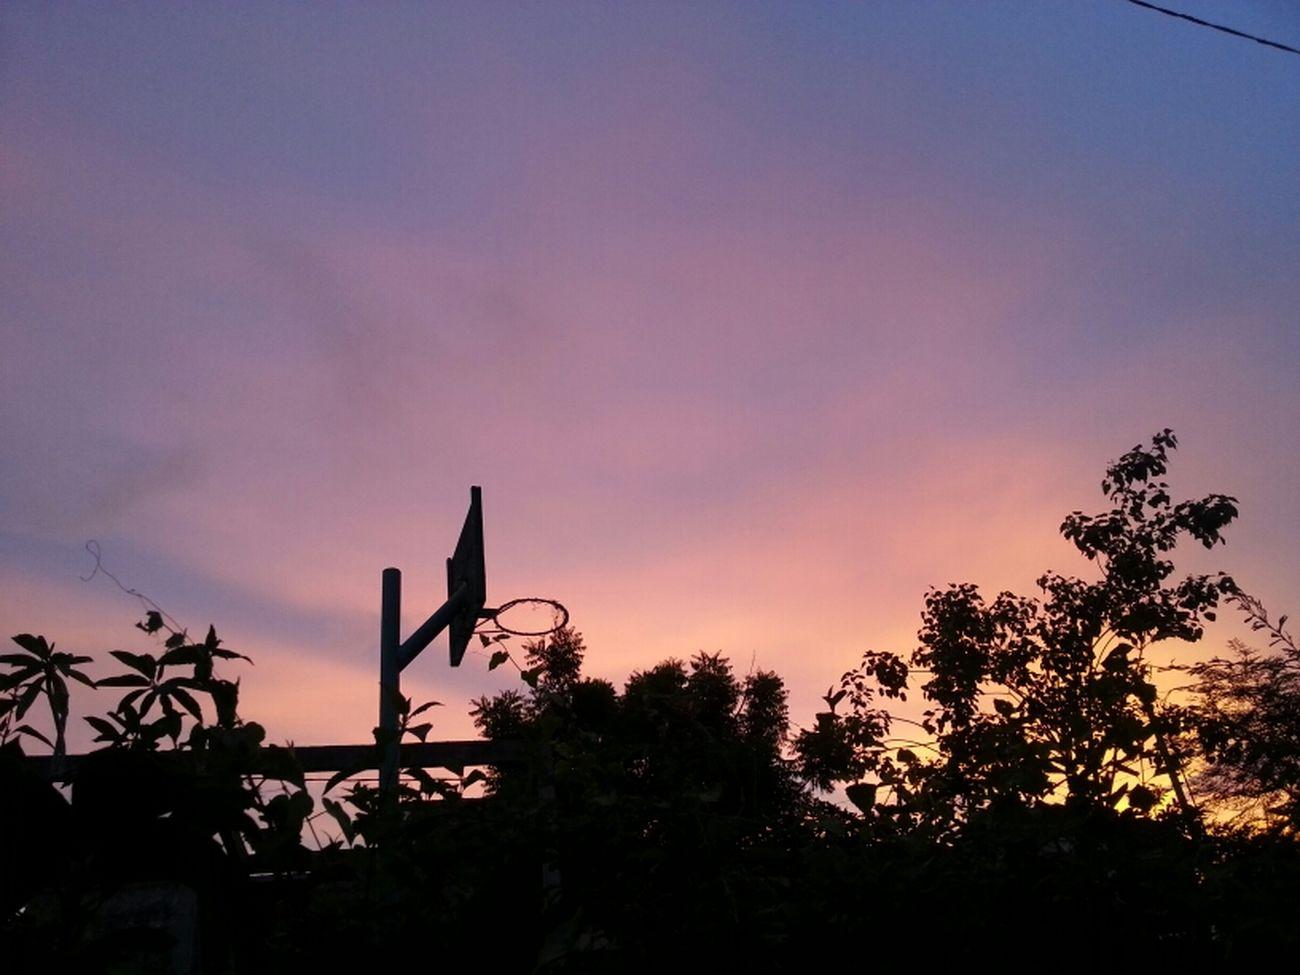 the basket ball ring Sky Sunset